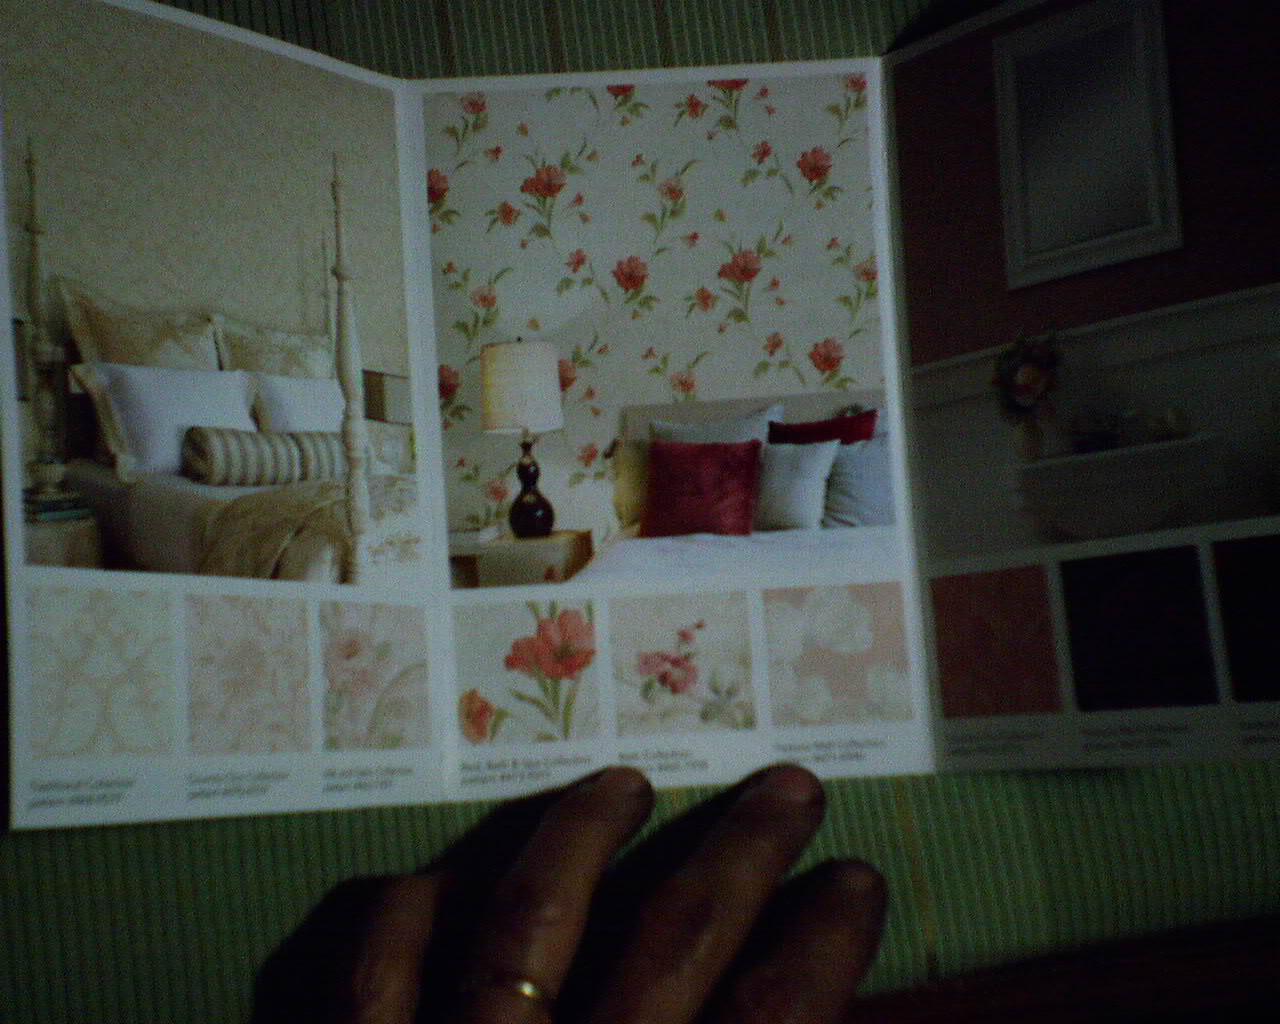 Sherwin williams people s choice wallpaper collections for Sherwin williams wallpaper